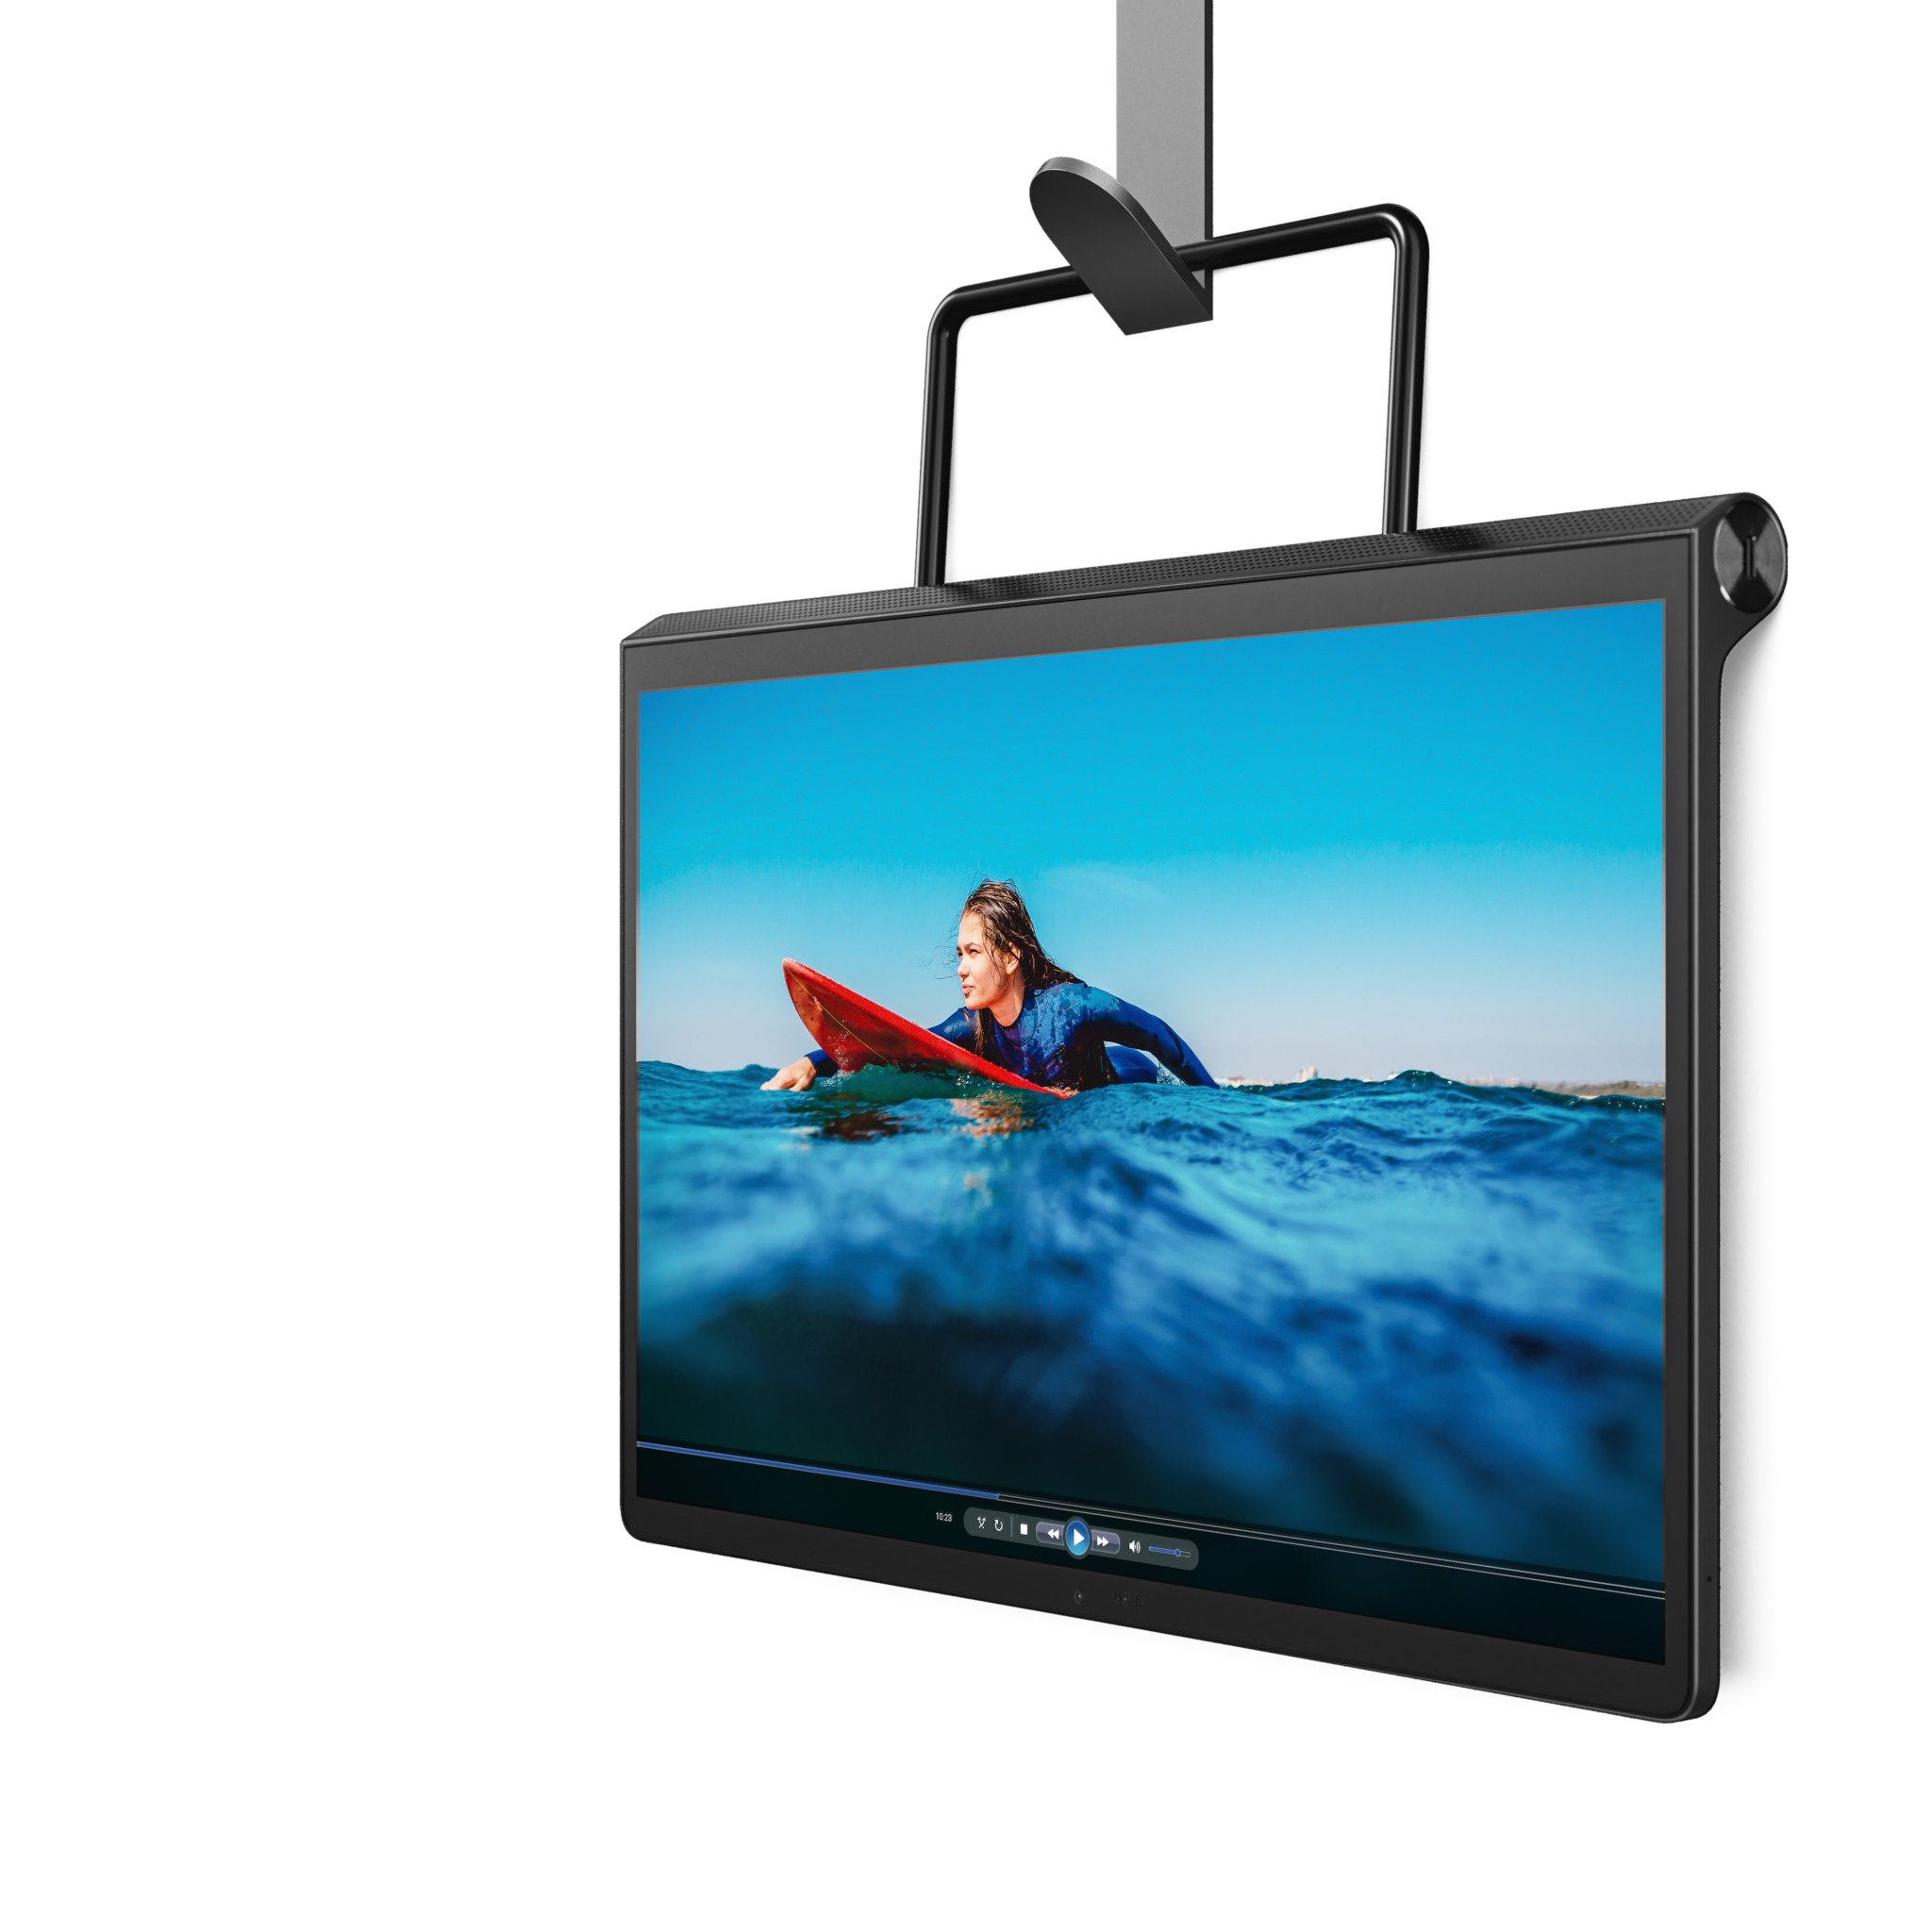 Lenovo Yoga Tab 13 - cinematic tablet for home entertainment